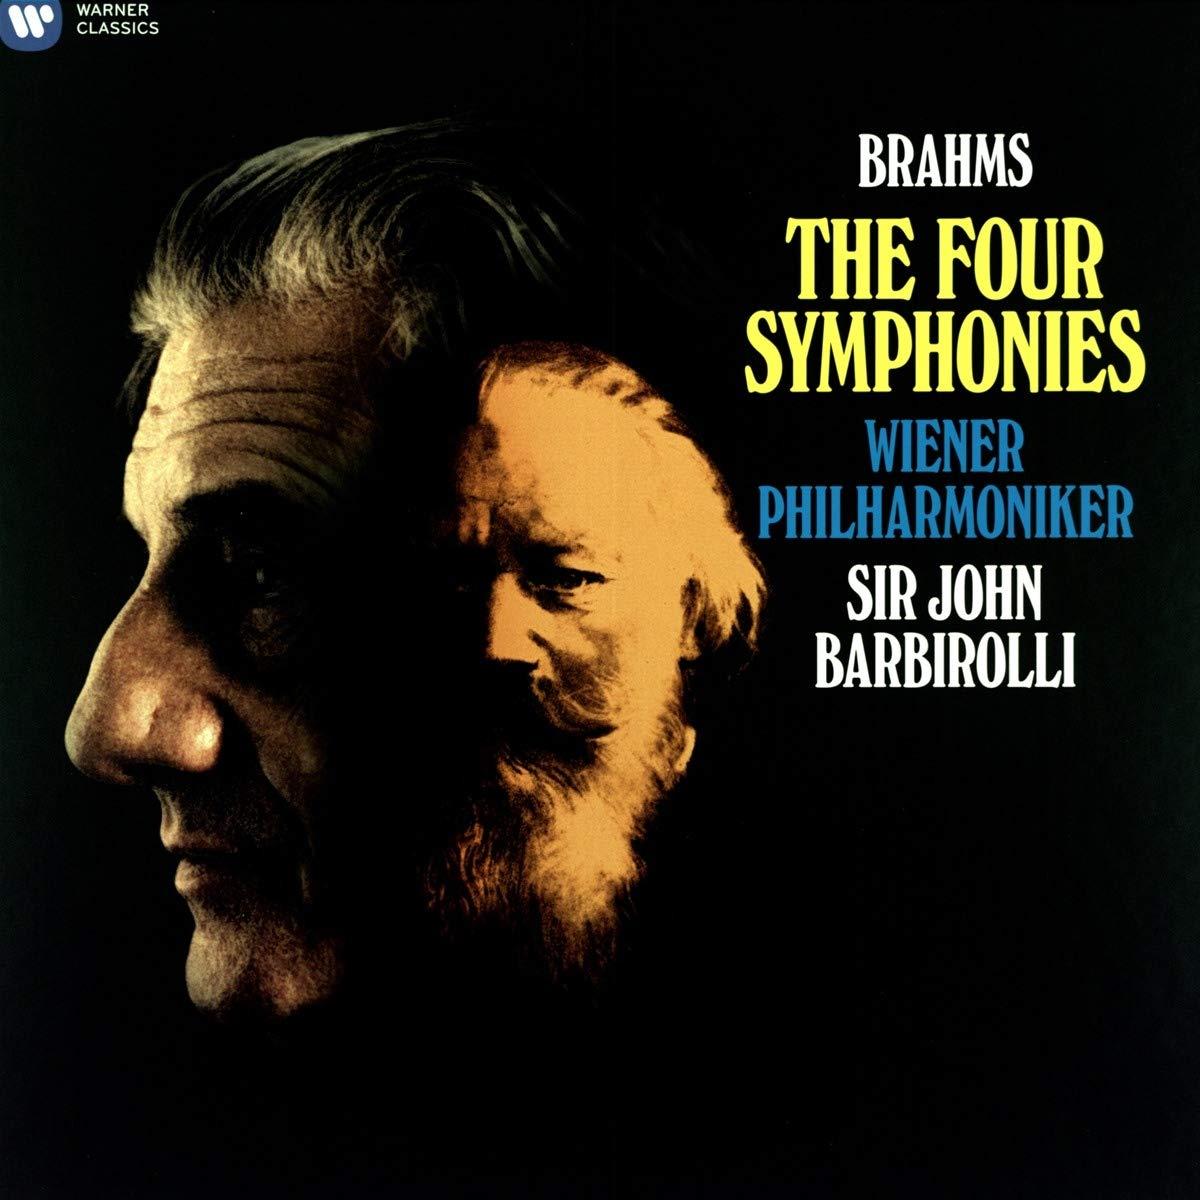 Sir John Barbirolli, Wiener Philharmoniker. Symphonies 1-4 (4 LP) рба бальзам д волос укрепляющий д всех типов волос 350мл 12шт 10111